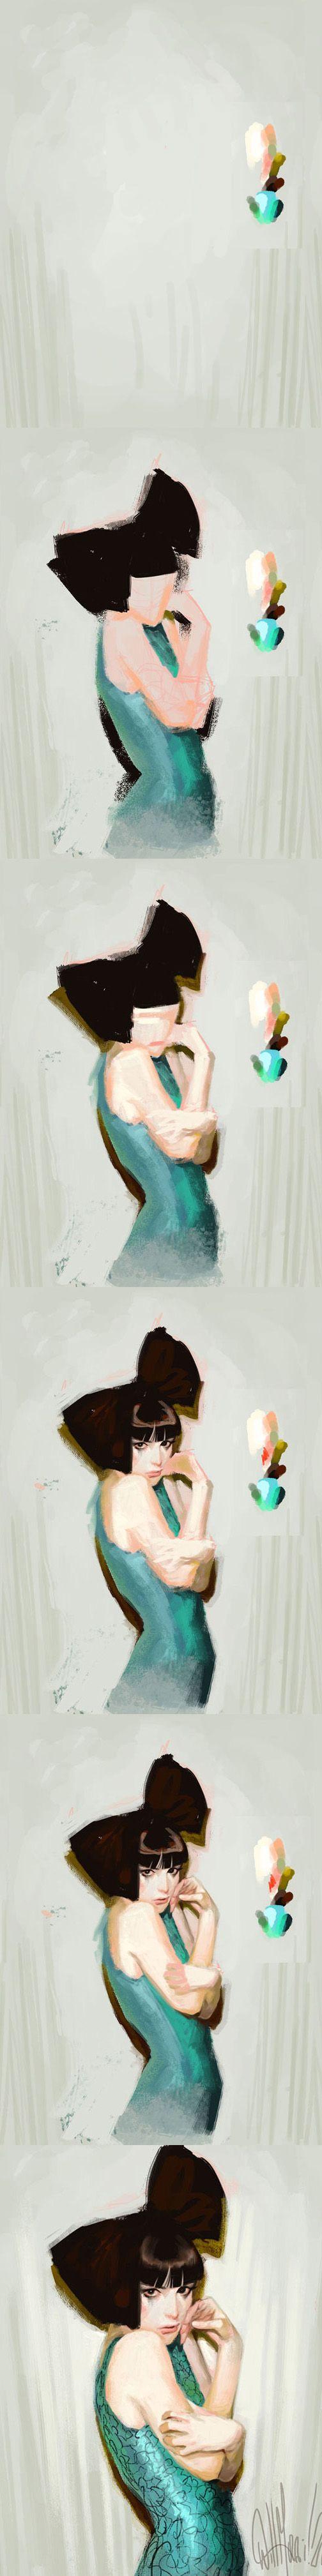 Character Design Digital Painting Tutorial : Best digital painting images on pinterest art